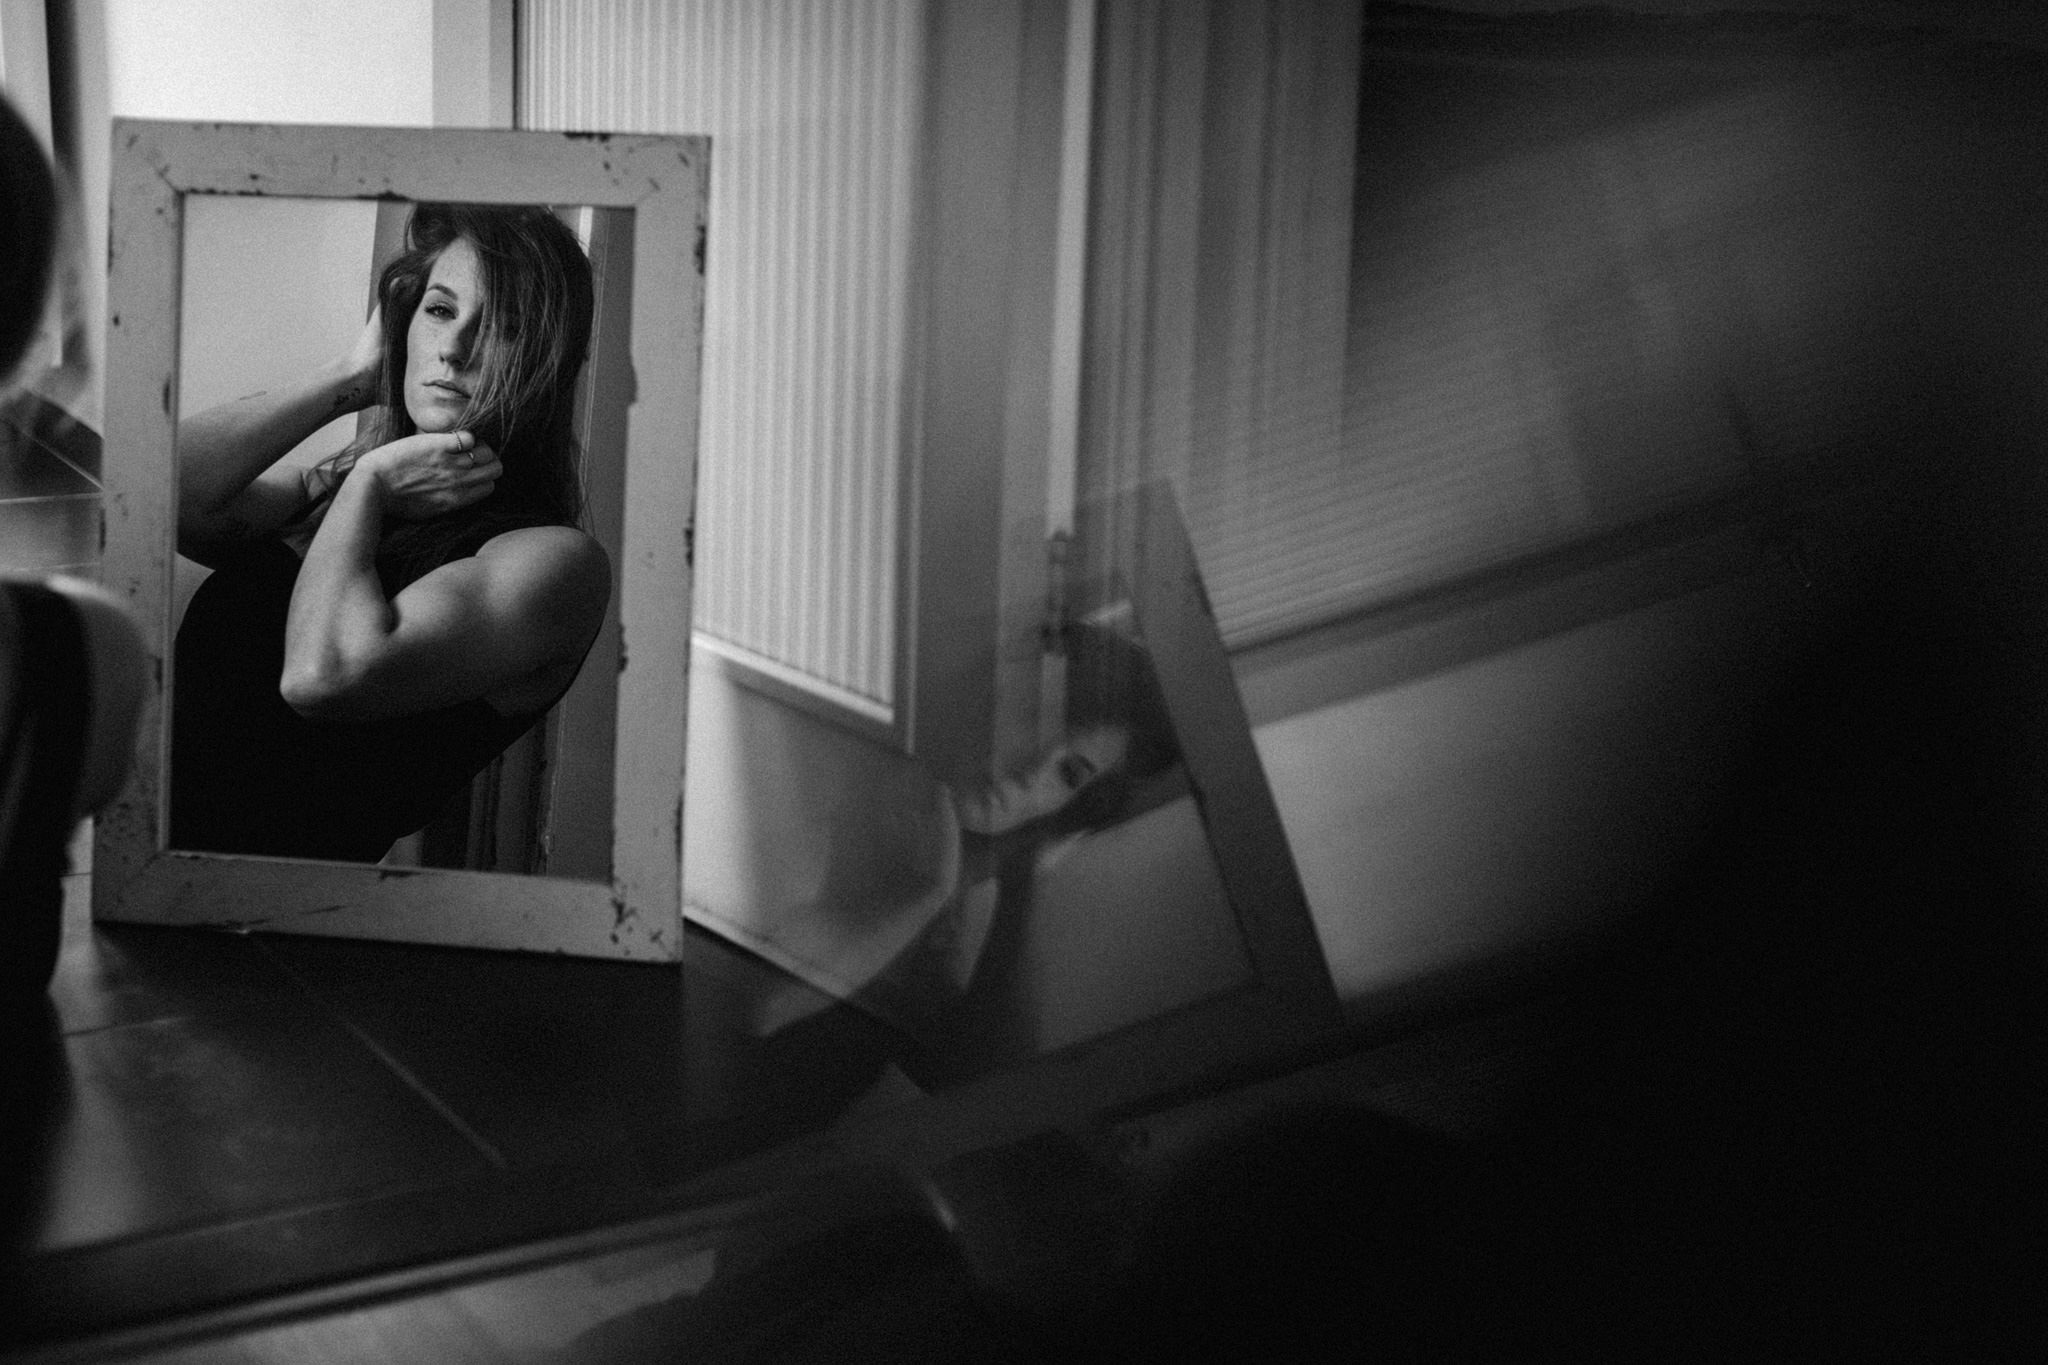 Girl in mirror facing camera